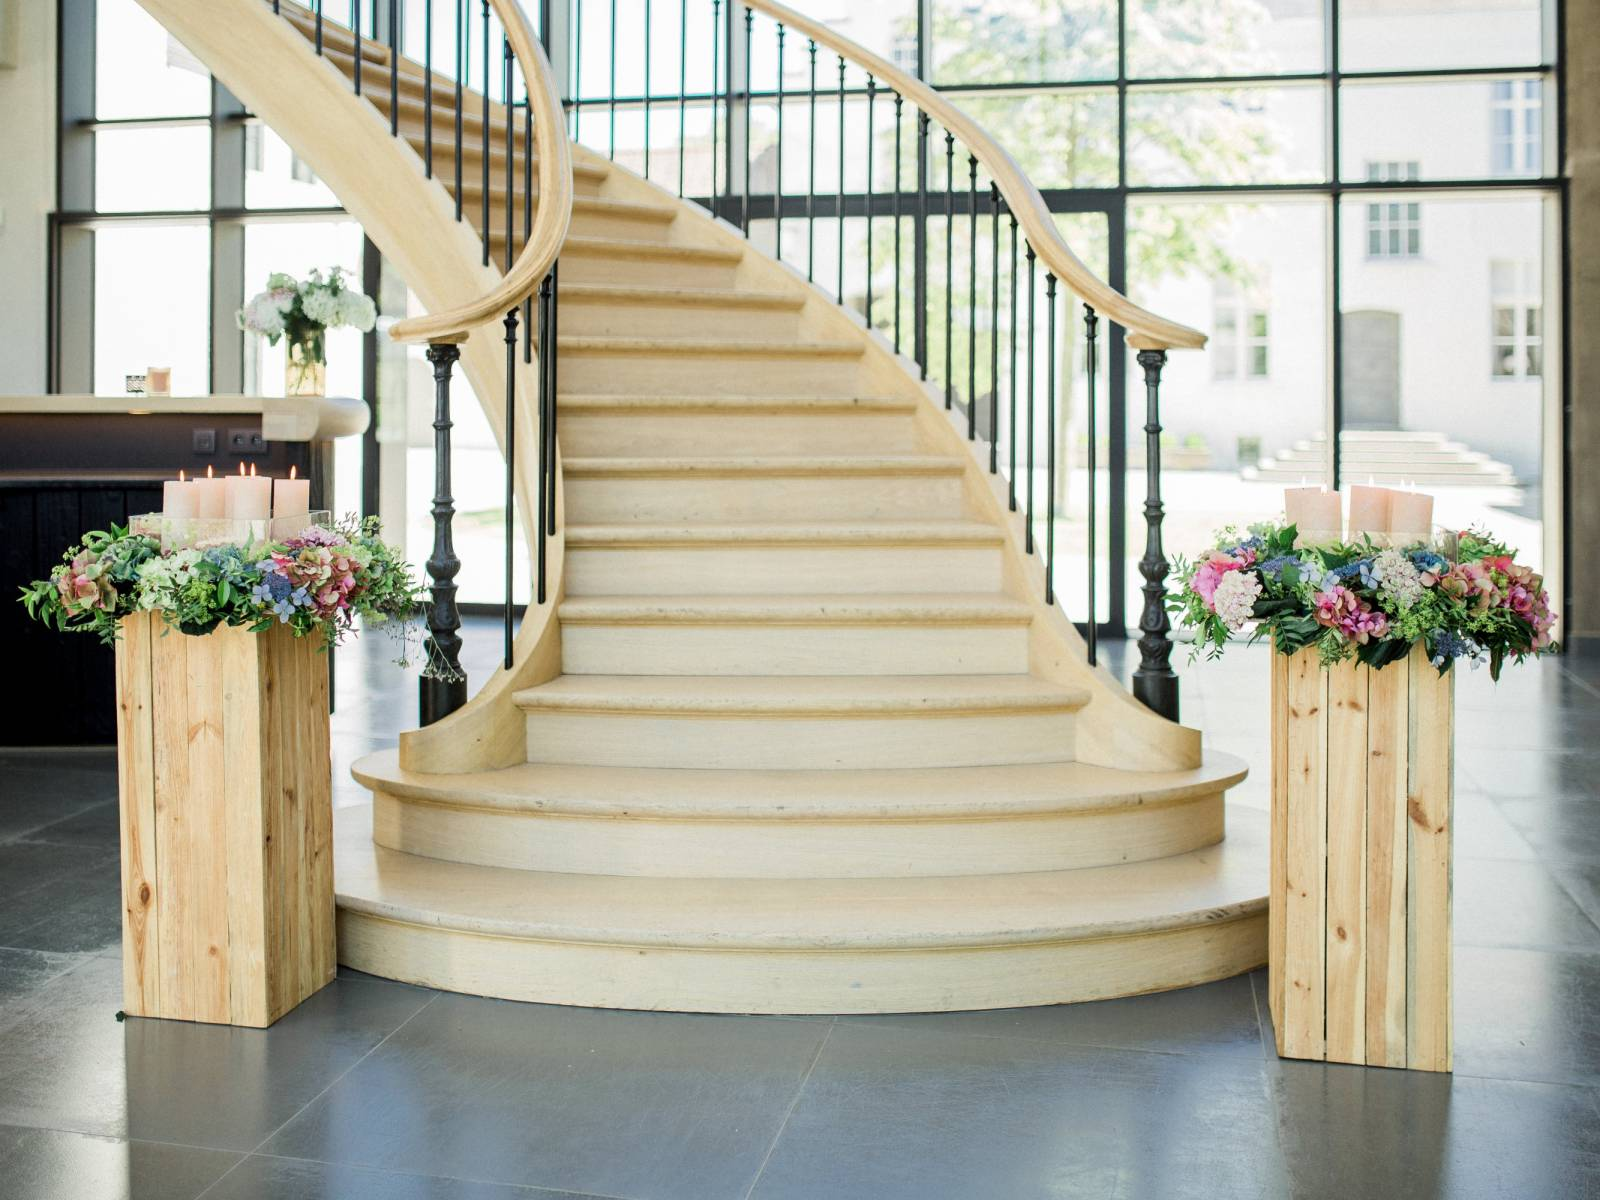 Chou Fleur - Bloemist - Fotograaf Elisabeth Van Lent Fine Art Wedding Photography - House of Weddings (1) (Aangepast)